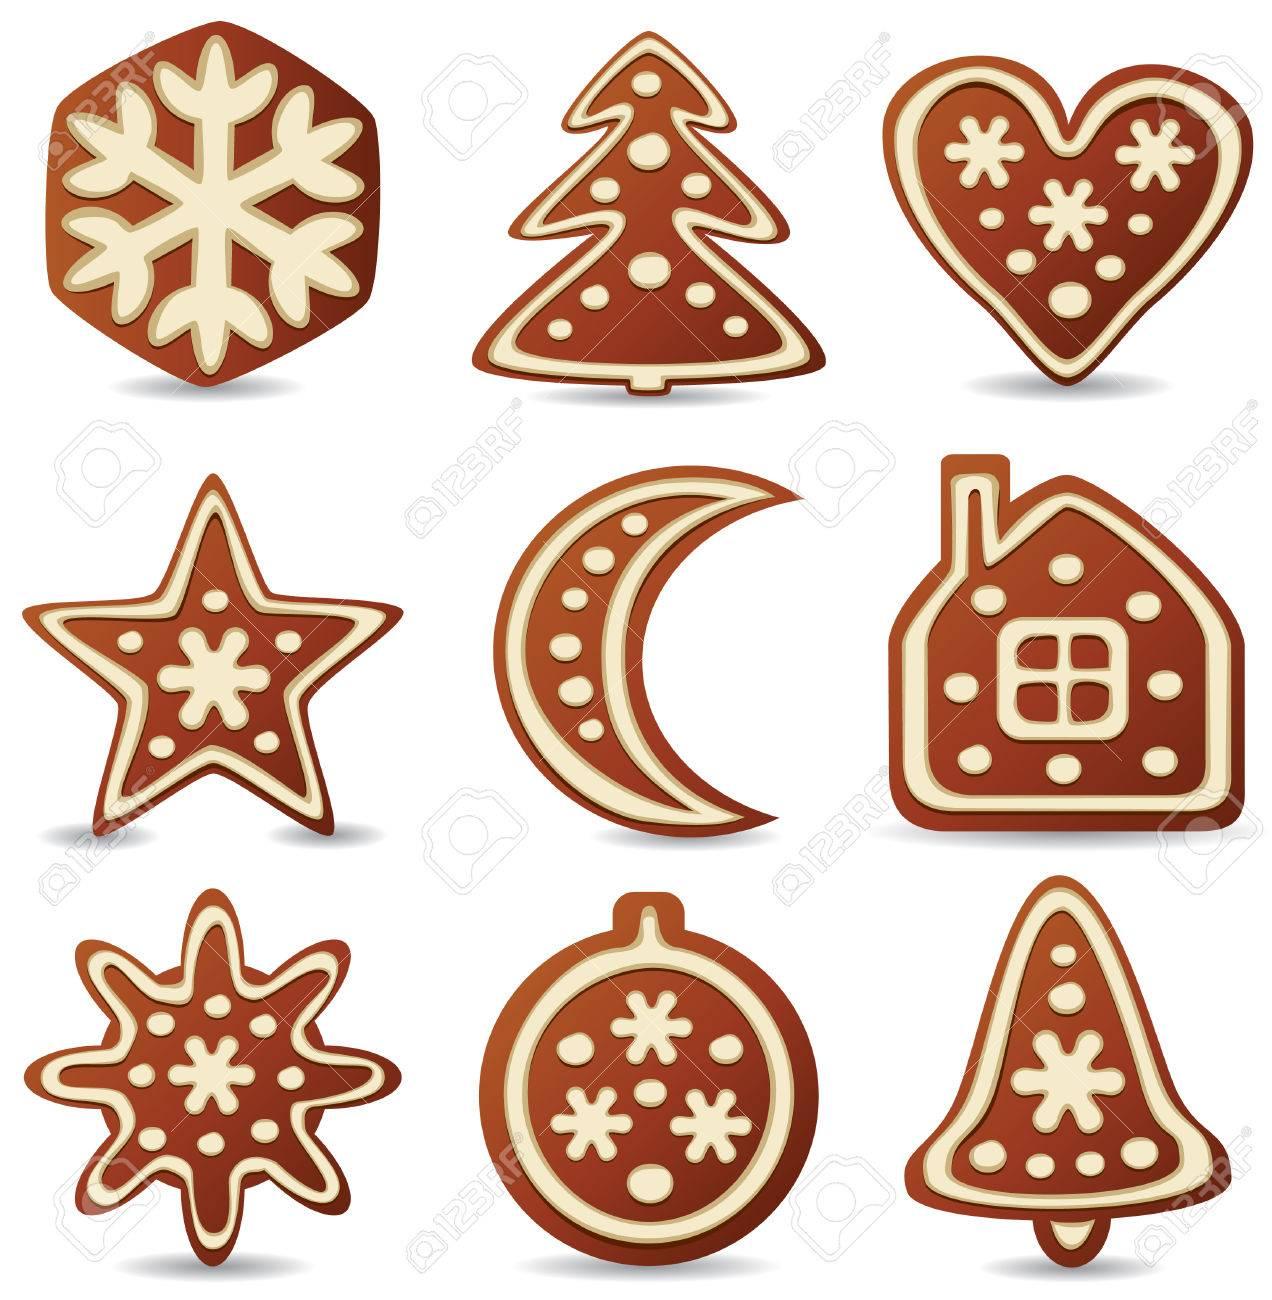 1272x1300 Set Of Nine Gingerbread Cookies Royalty Free Cliparts, Vectors